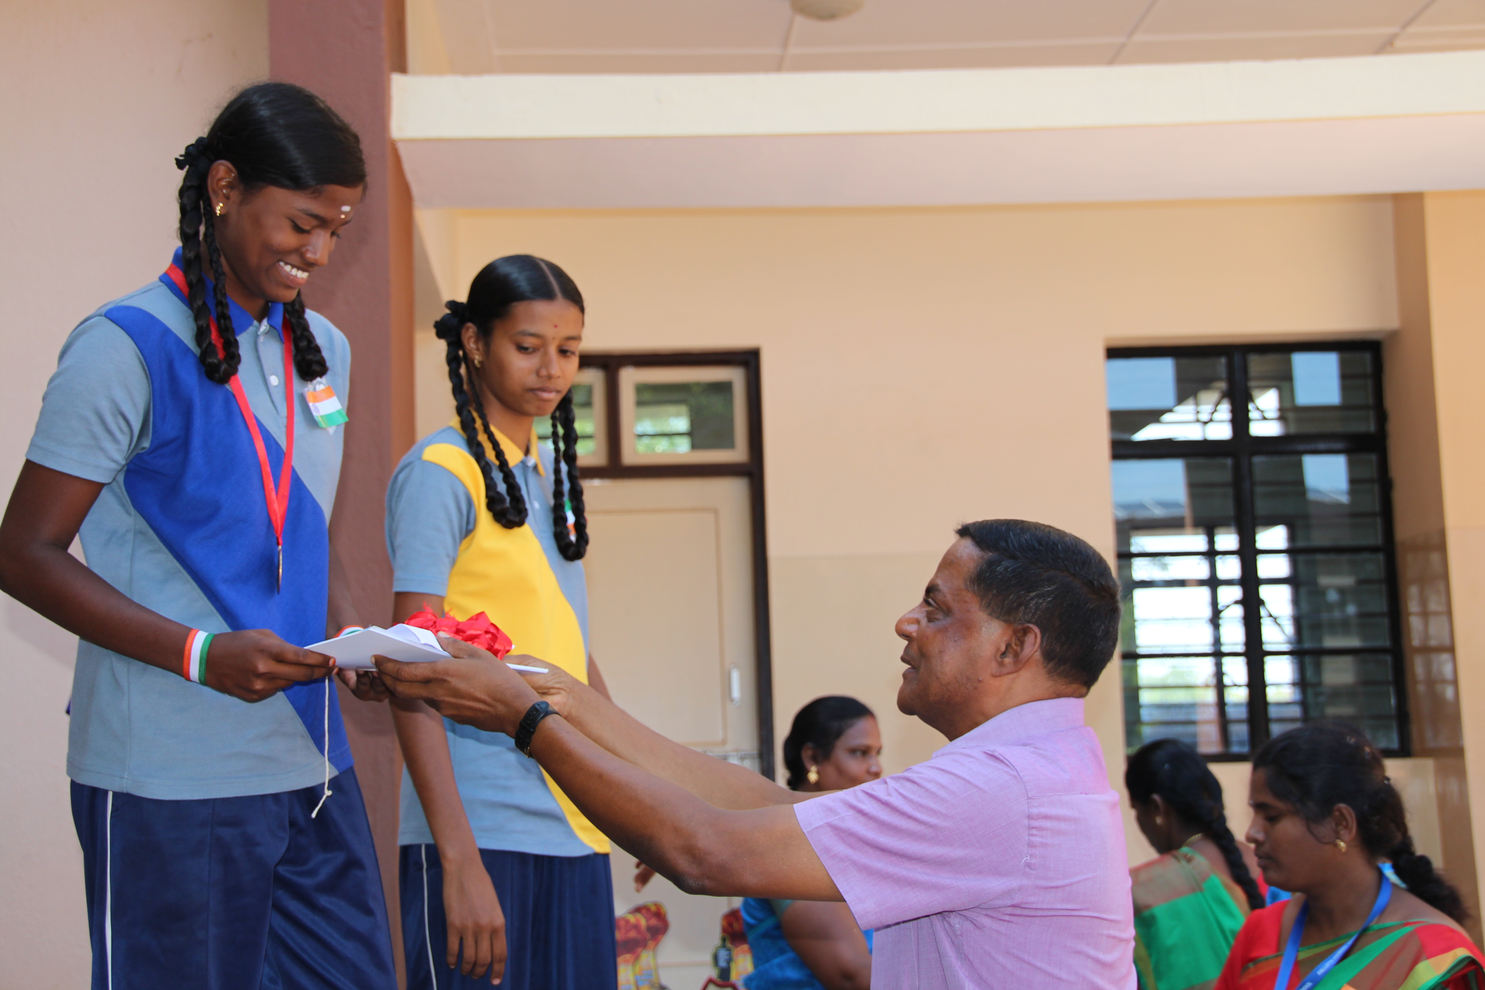 Winners receiving medals